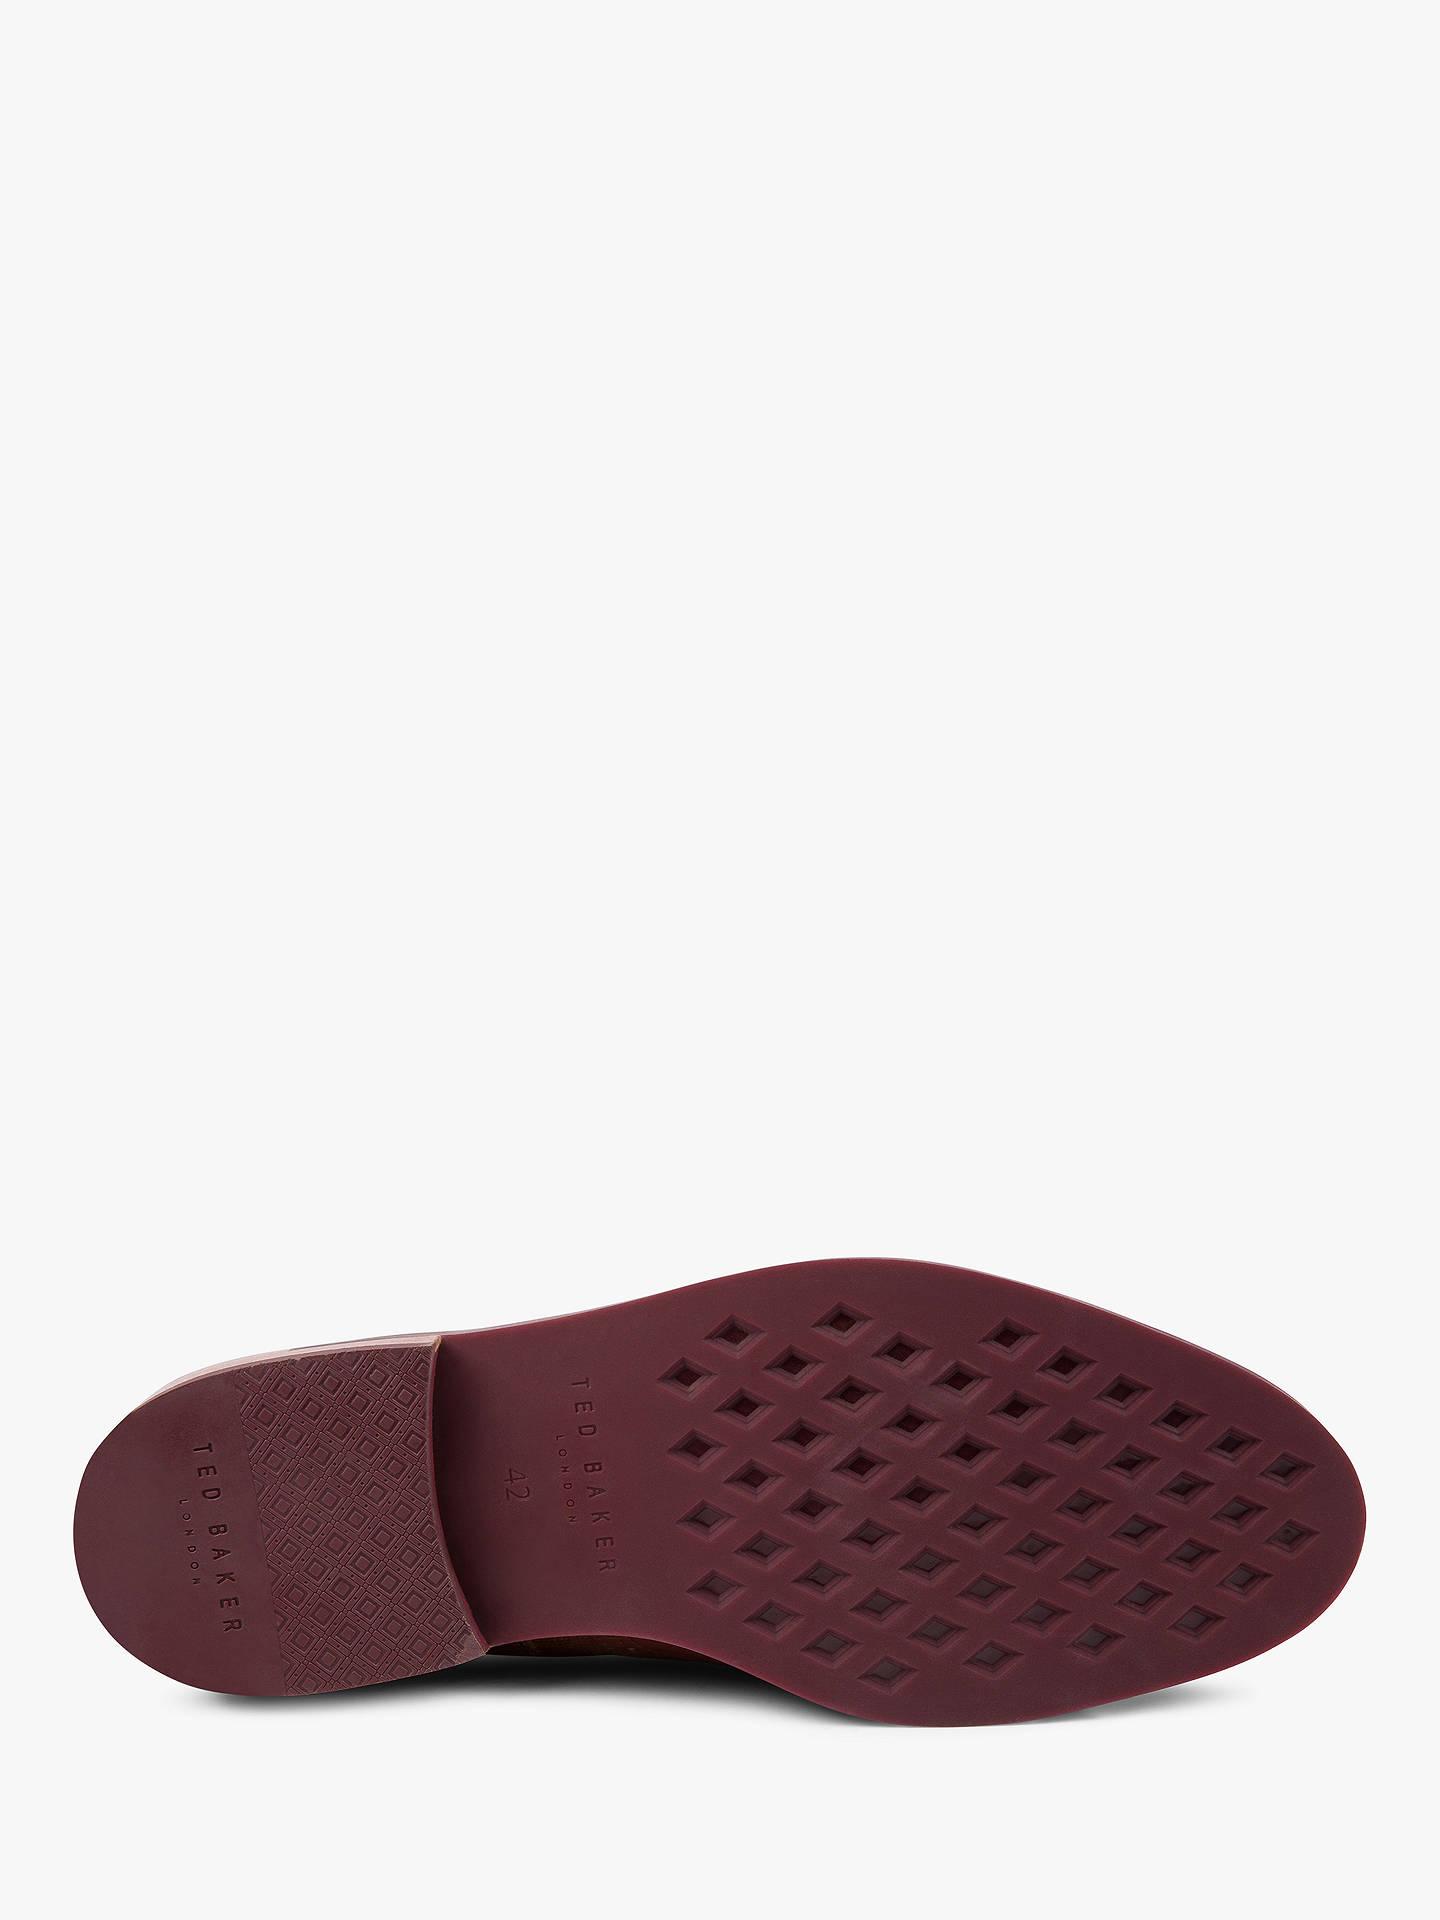 bce0159174c1 ... Buy Ted Baker Hjenno Brogue Boots